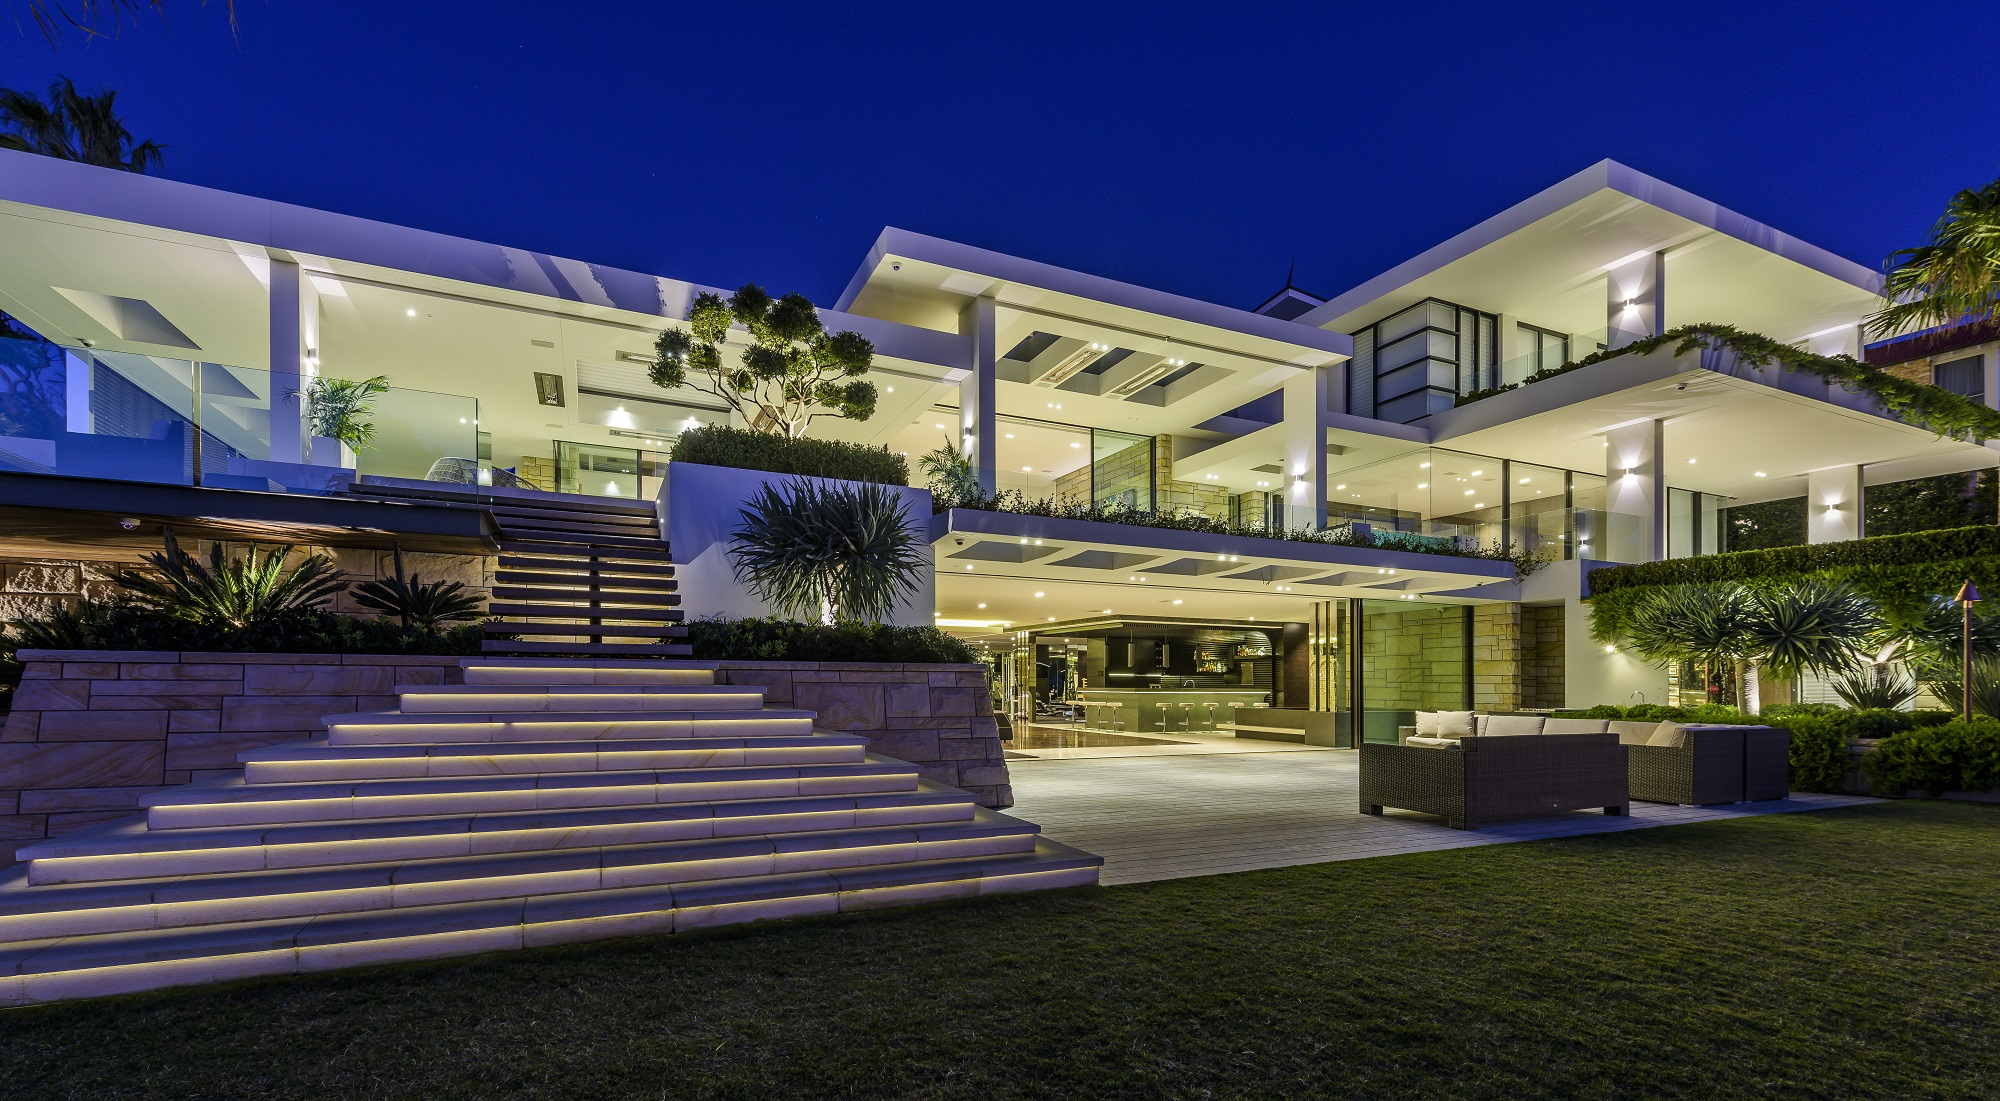 Luxury home burraneer bay nautilus house burraneer bay for Build a custom home online